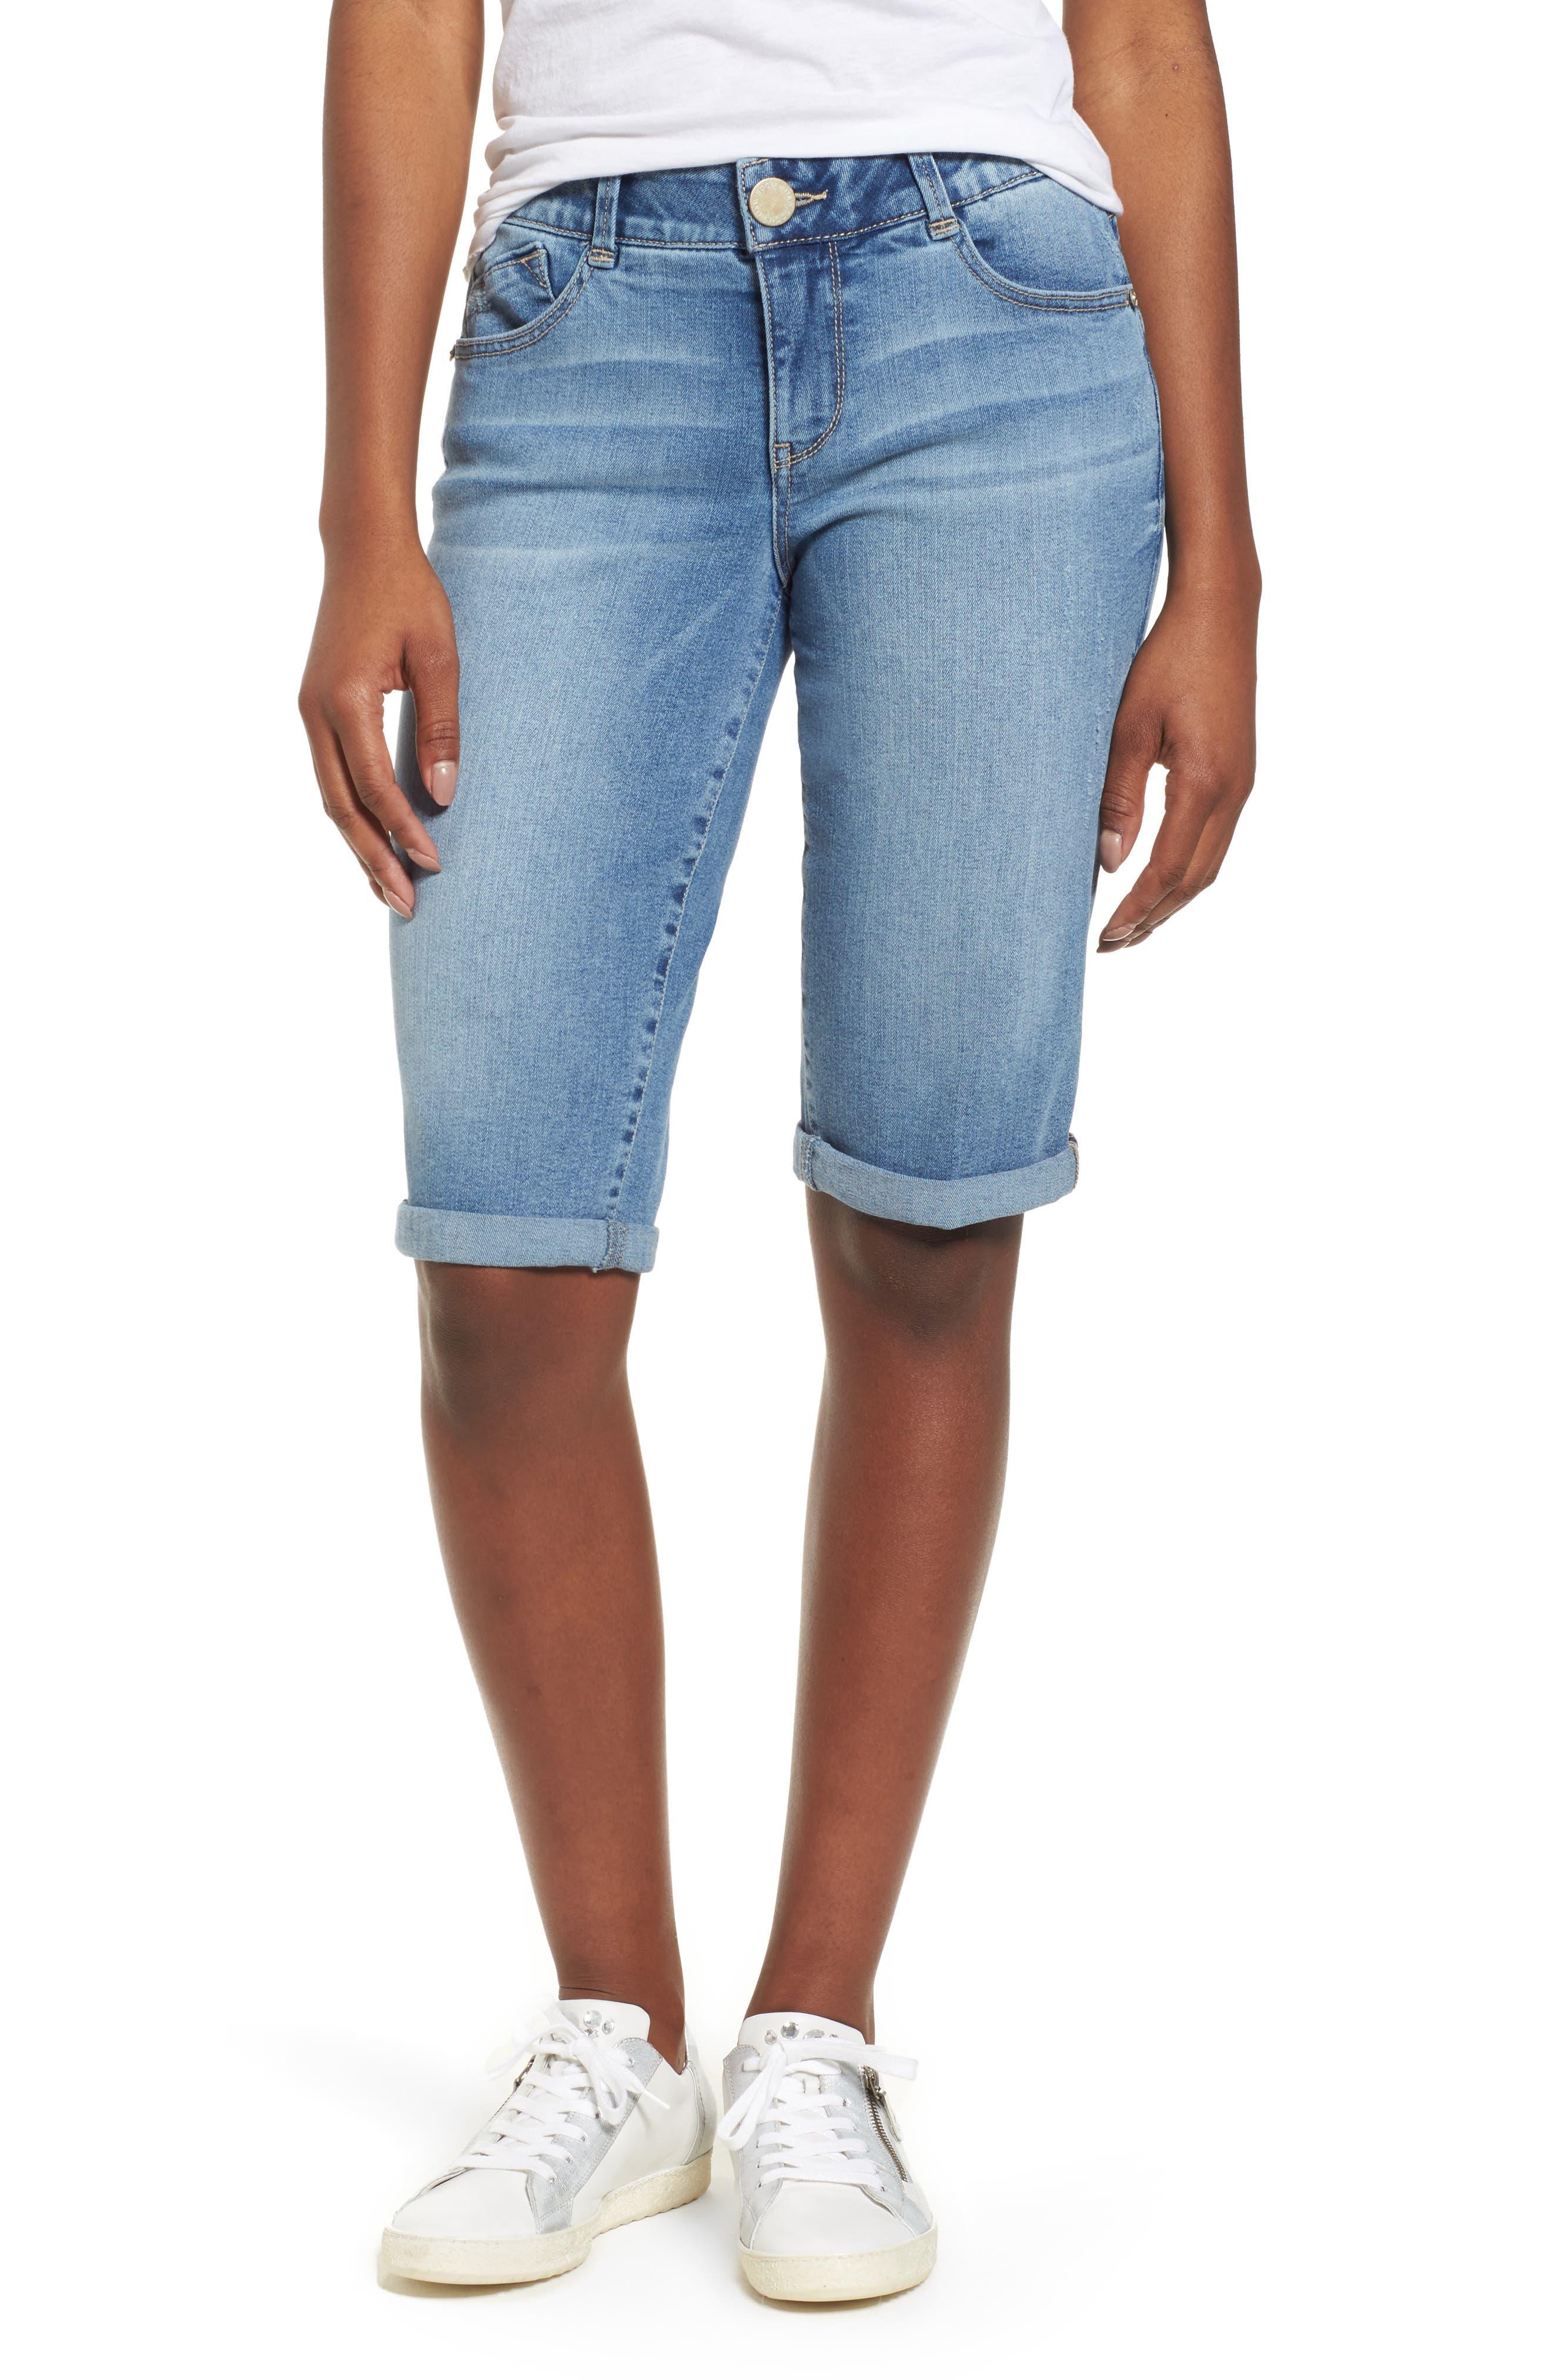 Ab-solution Cuffed Denim Shorts,                             Main thumbnail 1, color,                             LIGHT BLUE